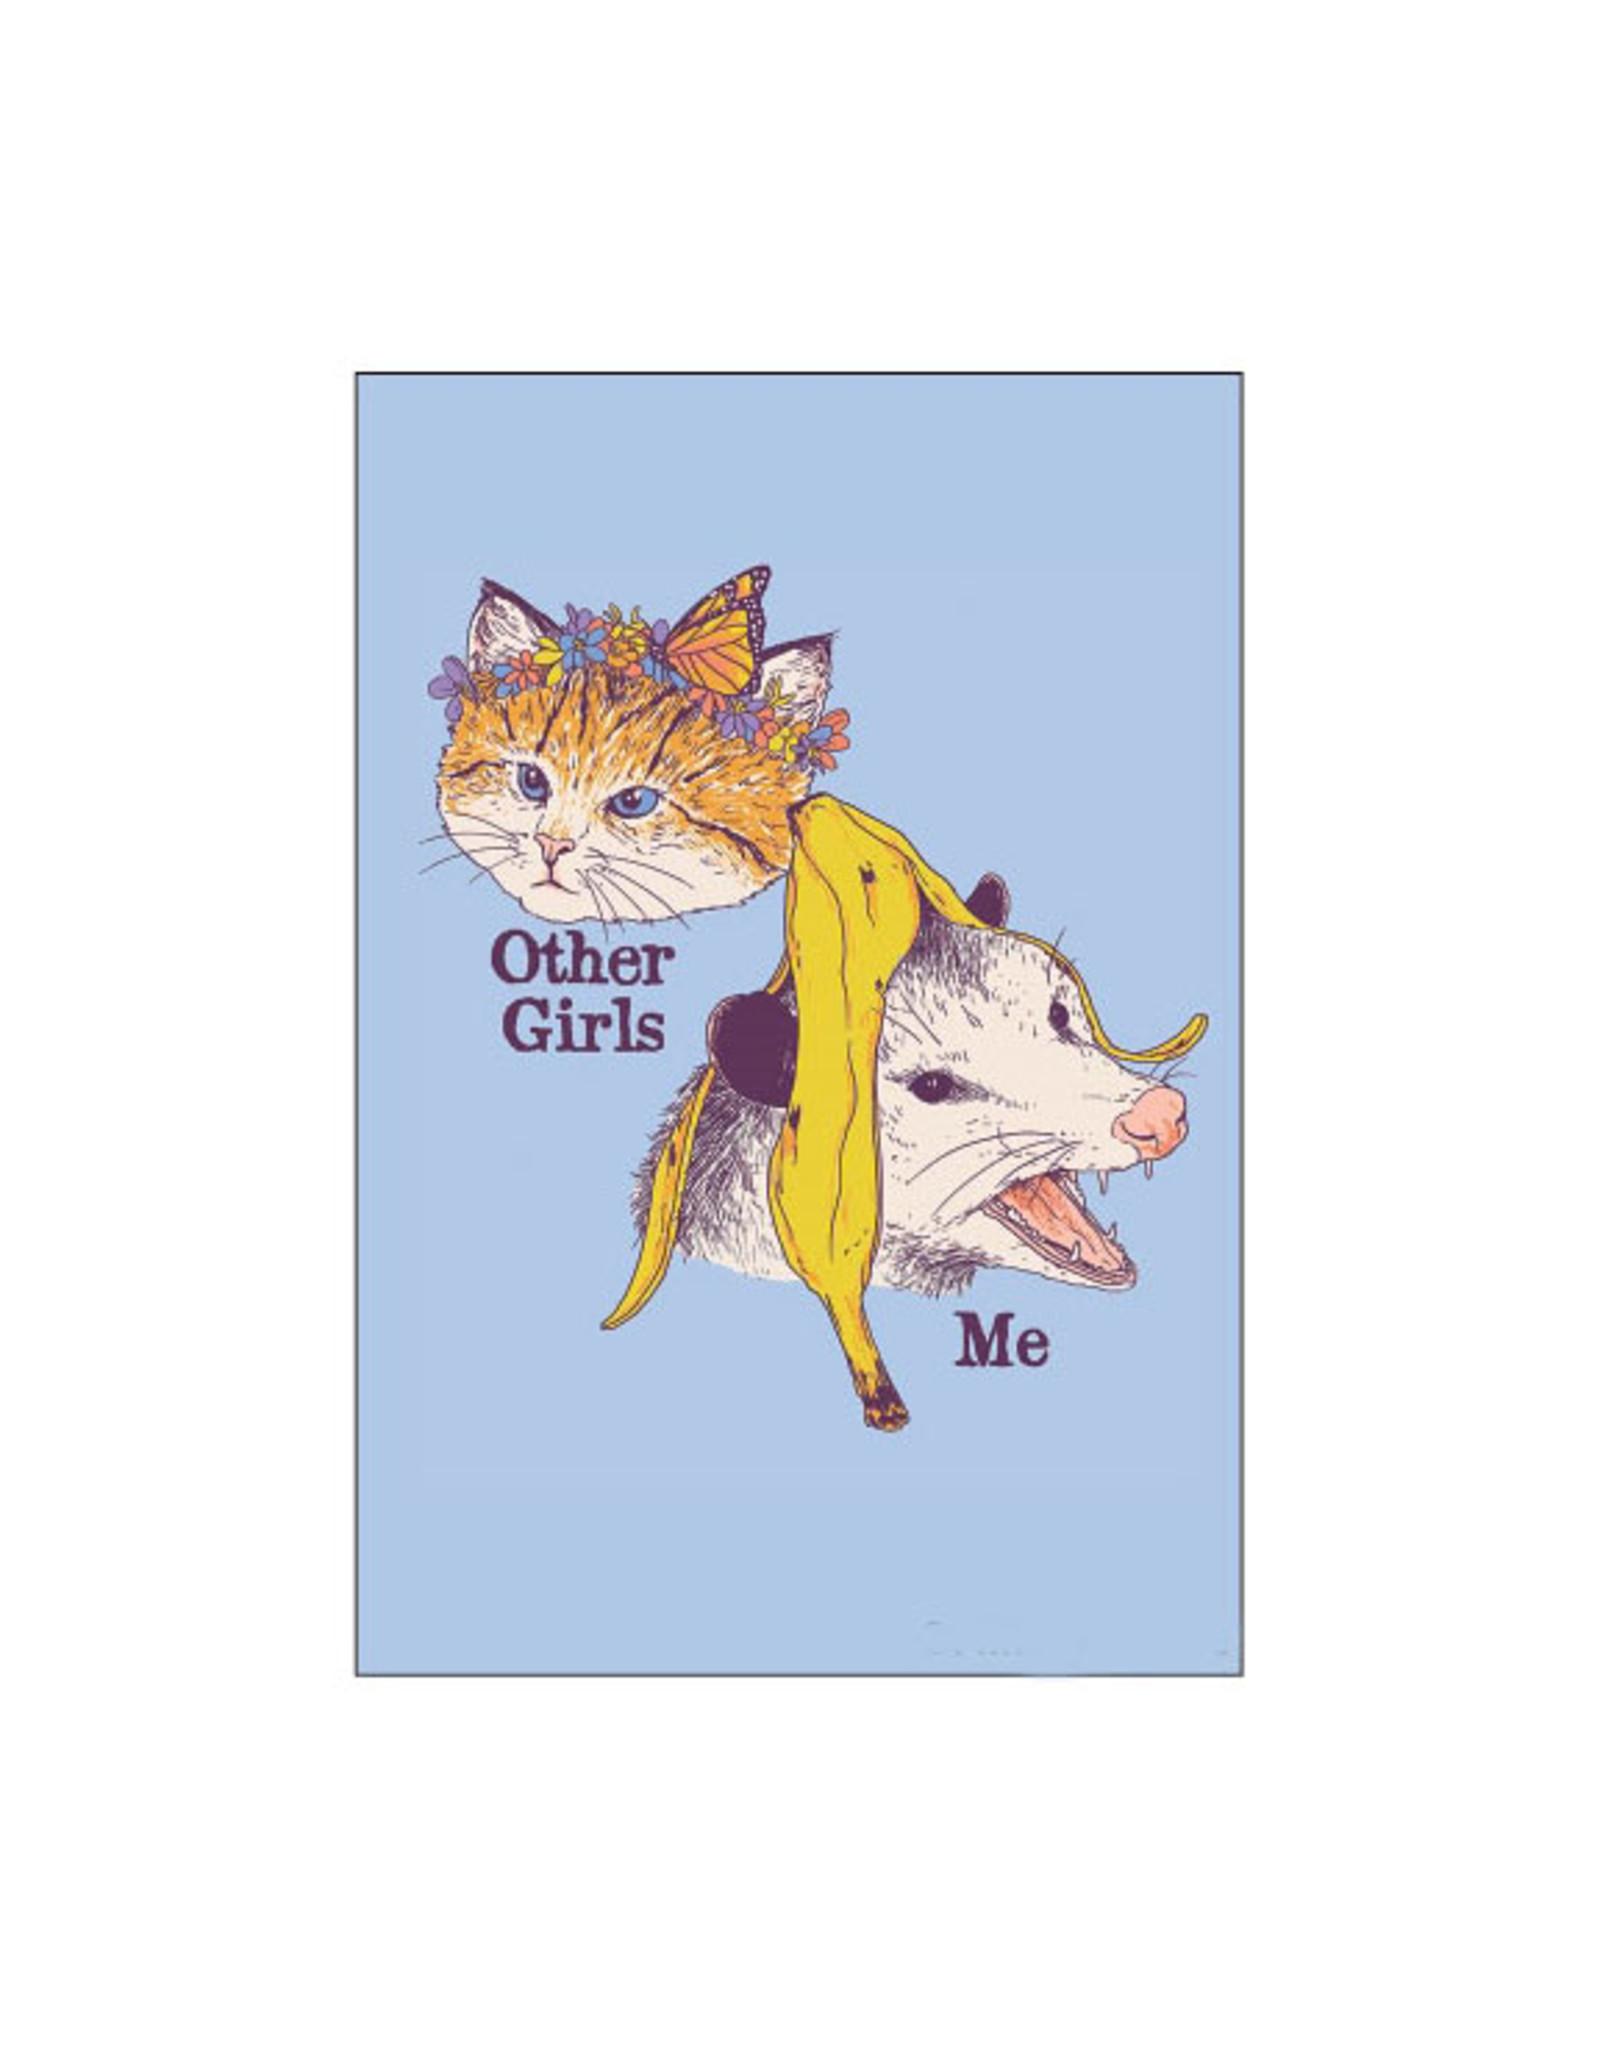 Other Girls, Me (Cat, Opossum) Magnet